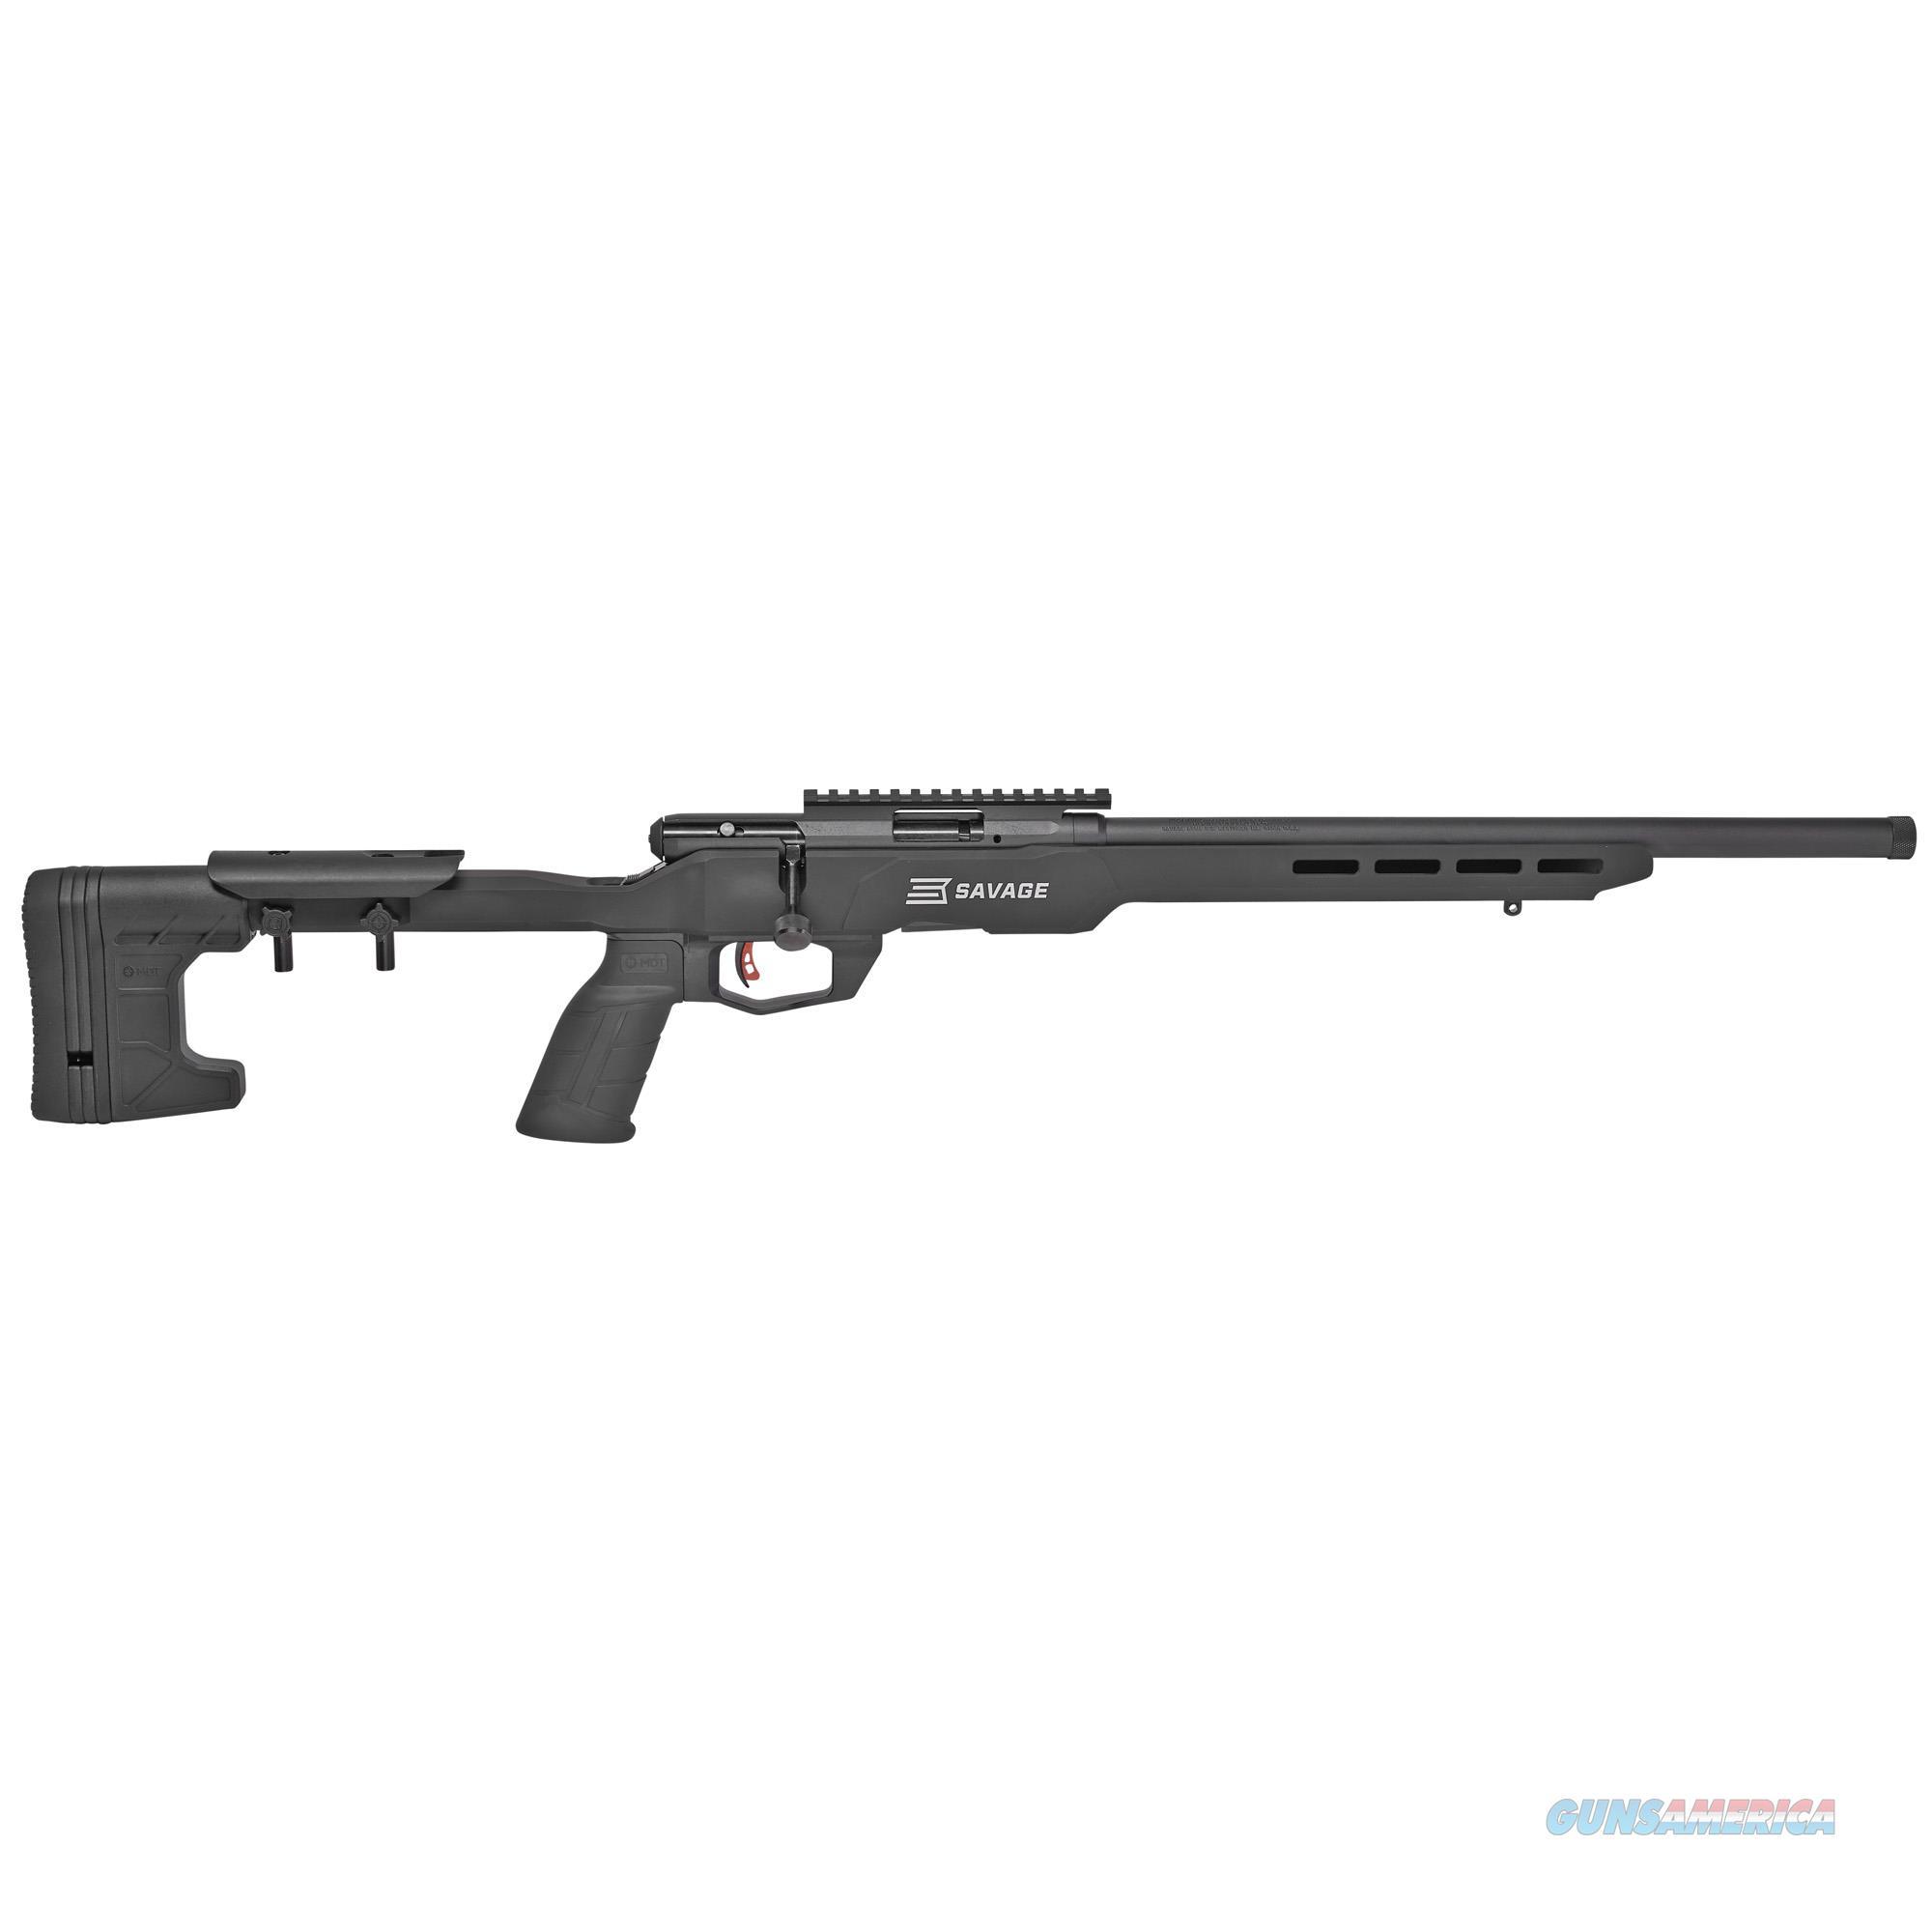 Savage B22, Sav 70548 B22 Precision 22wmr Bolt  Guns > Pistols > 1911 Pistol Copies (non-Colt)